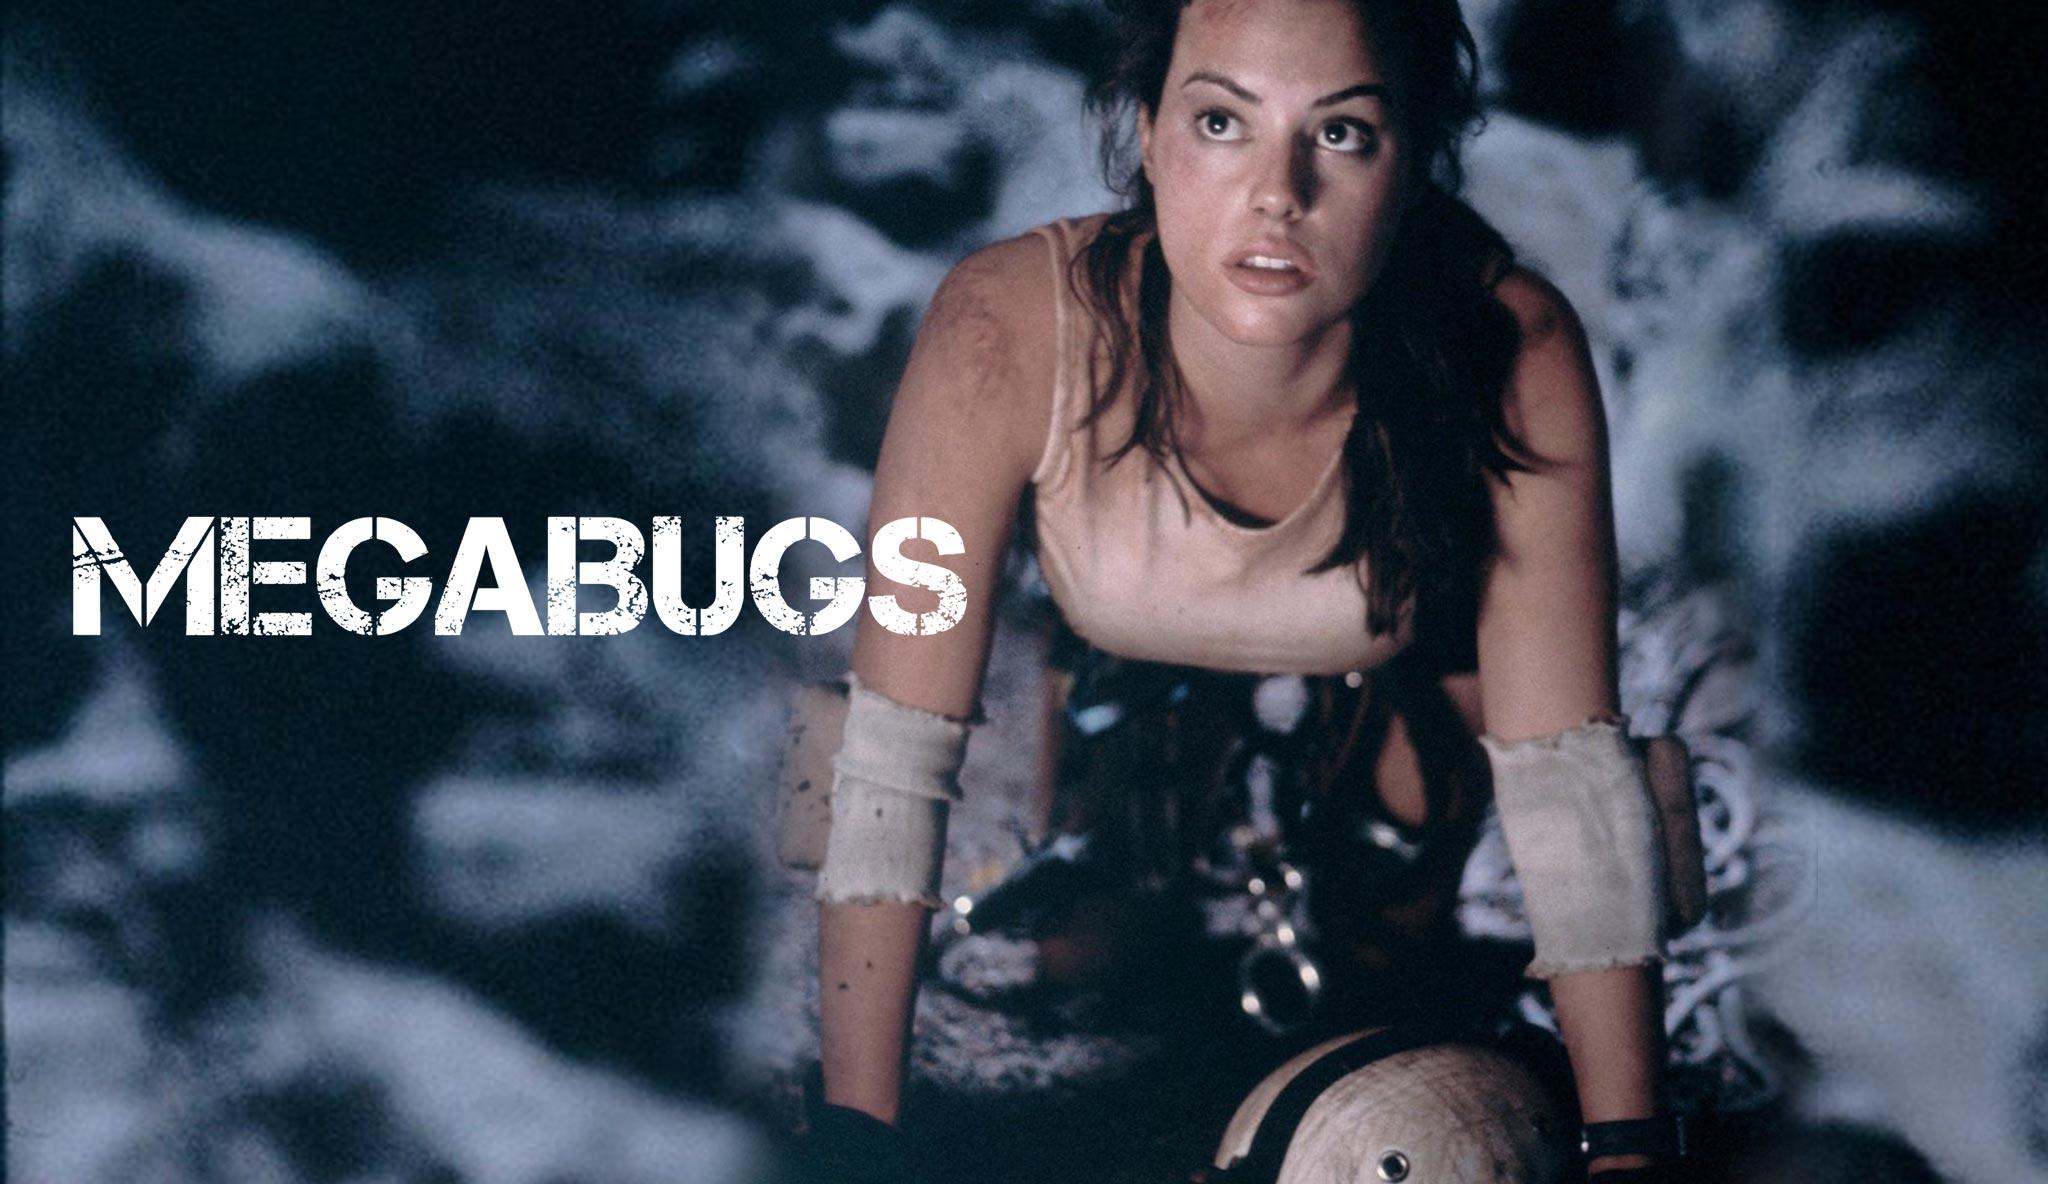 mega-bugs-sie-fressen-dich\header.jpg